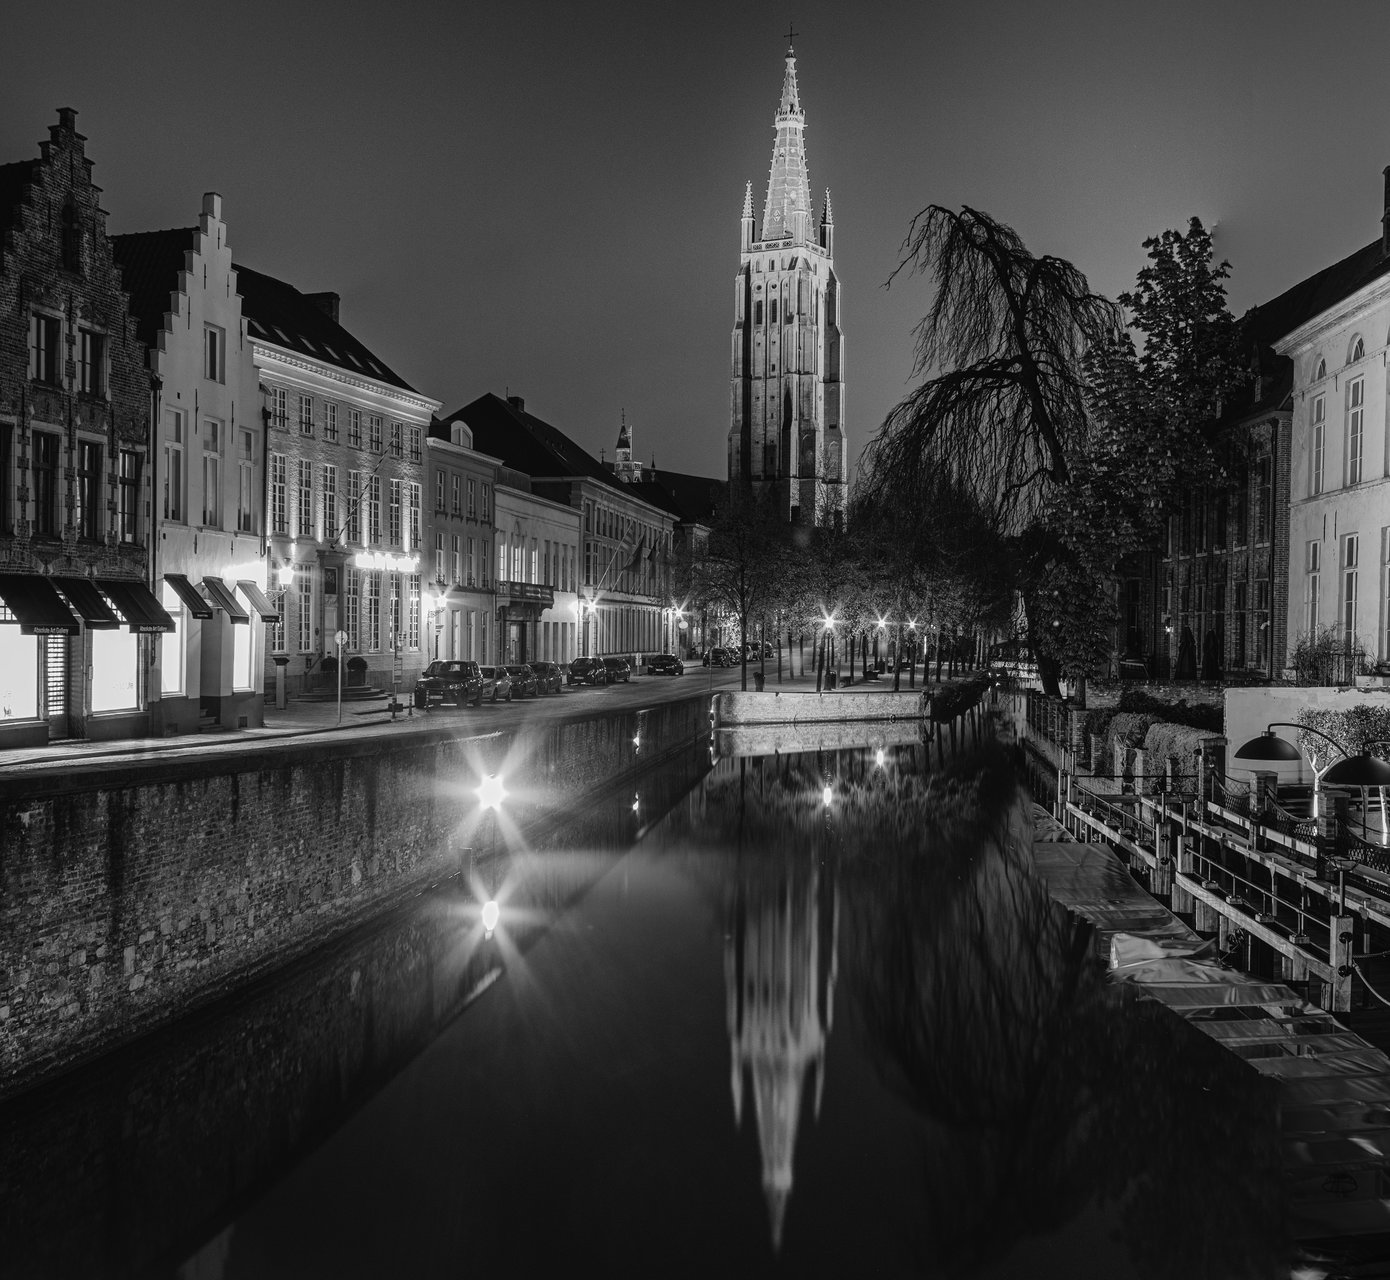 Bruge, Belgium | Author Dimitar Genchev - bogy82 | PHOTO FORUM